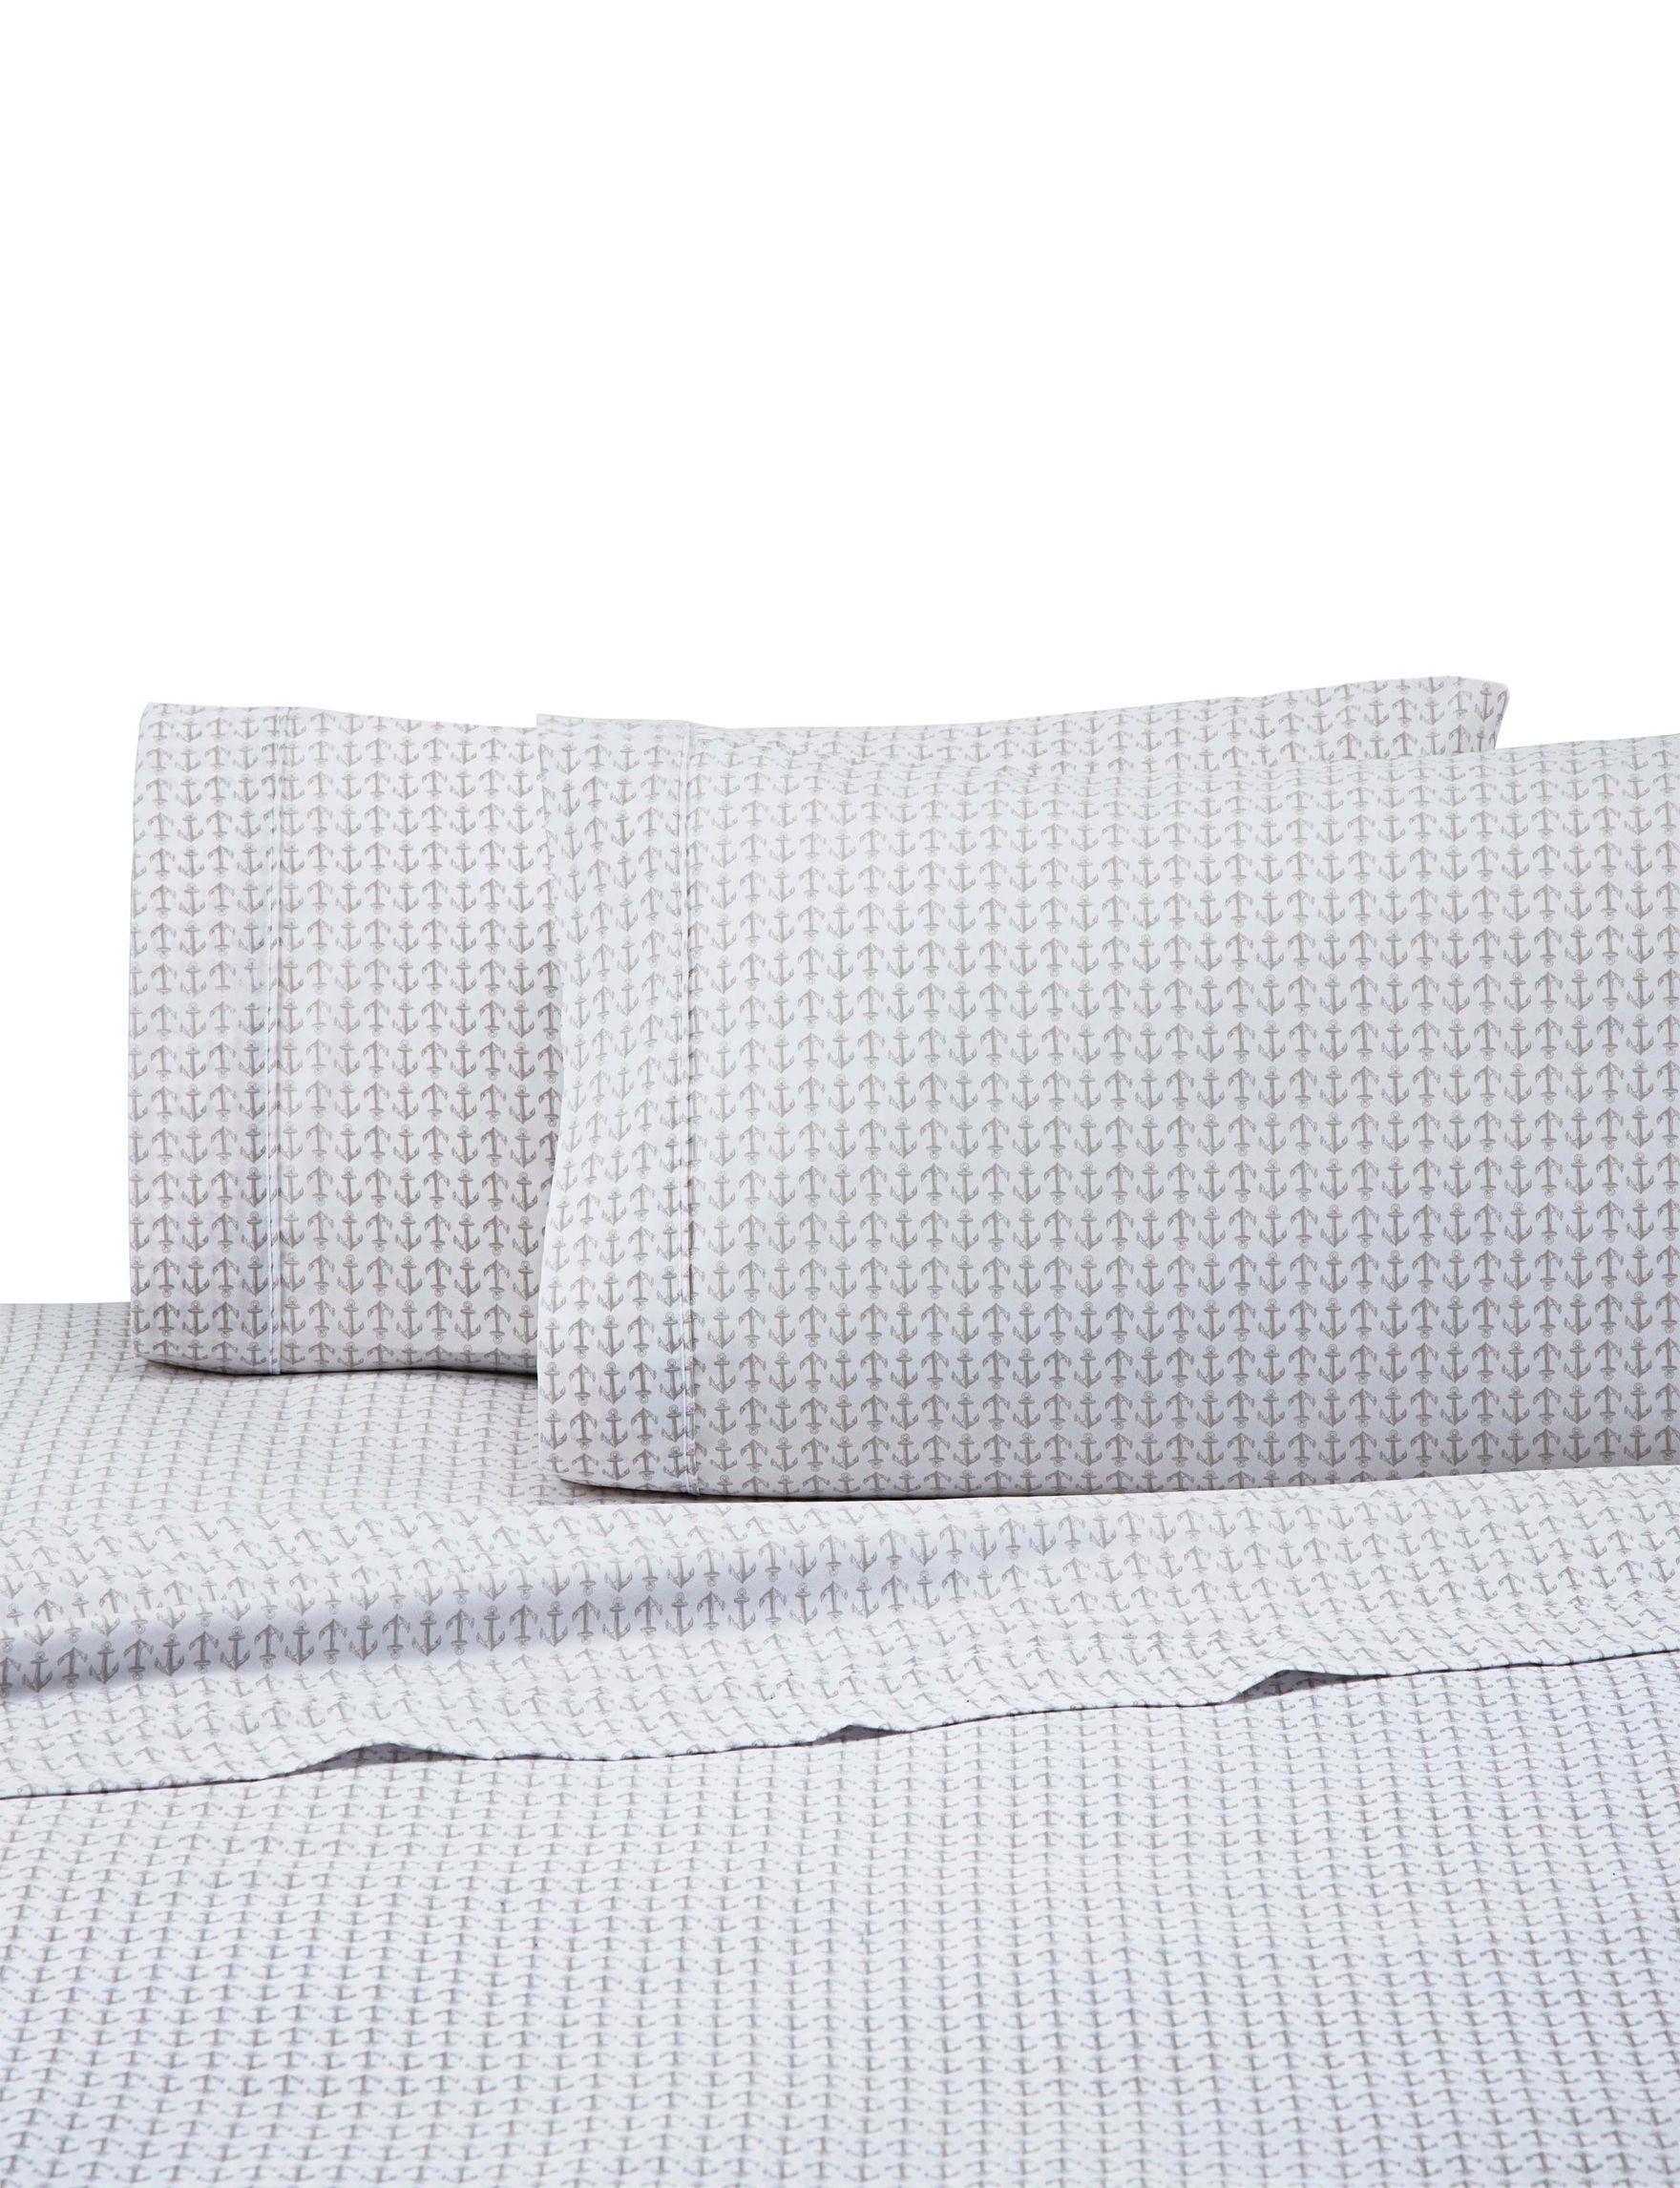 Izod White / Grey Sheets & Pillowcases